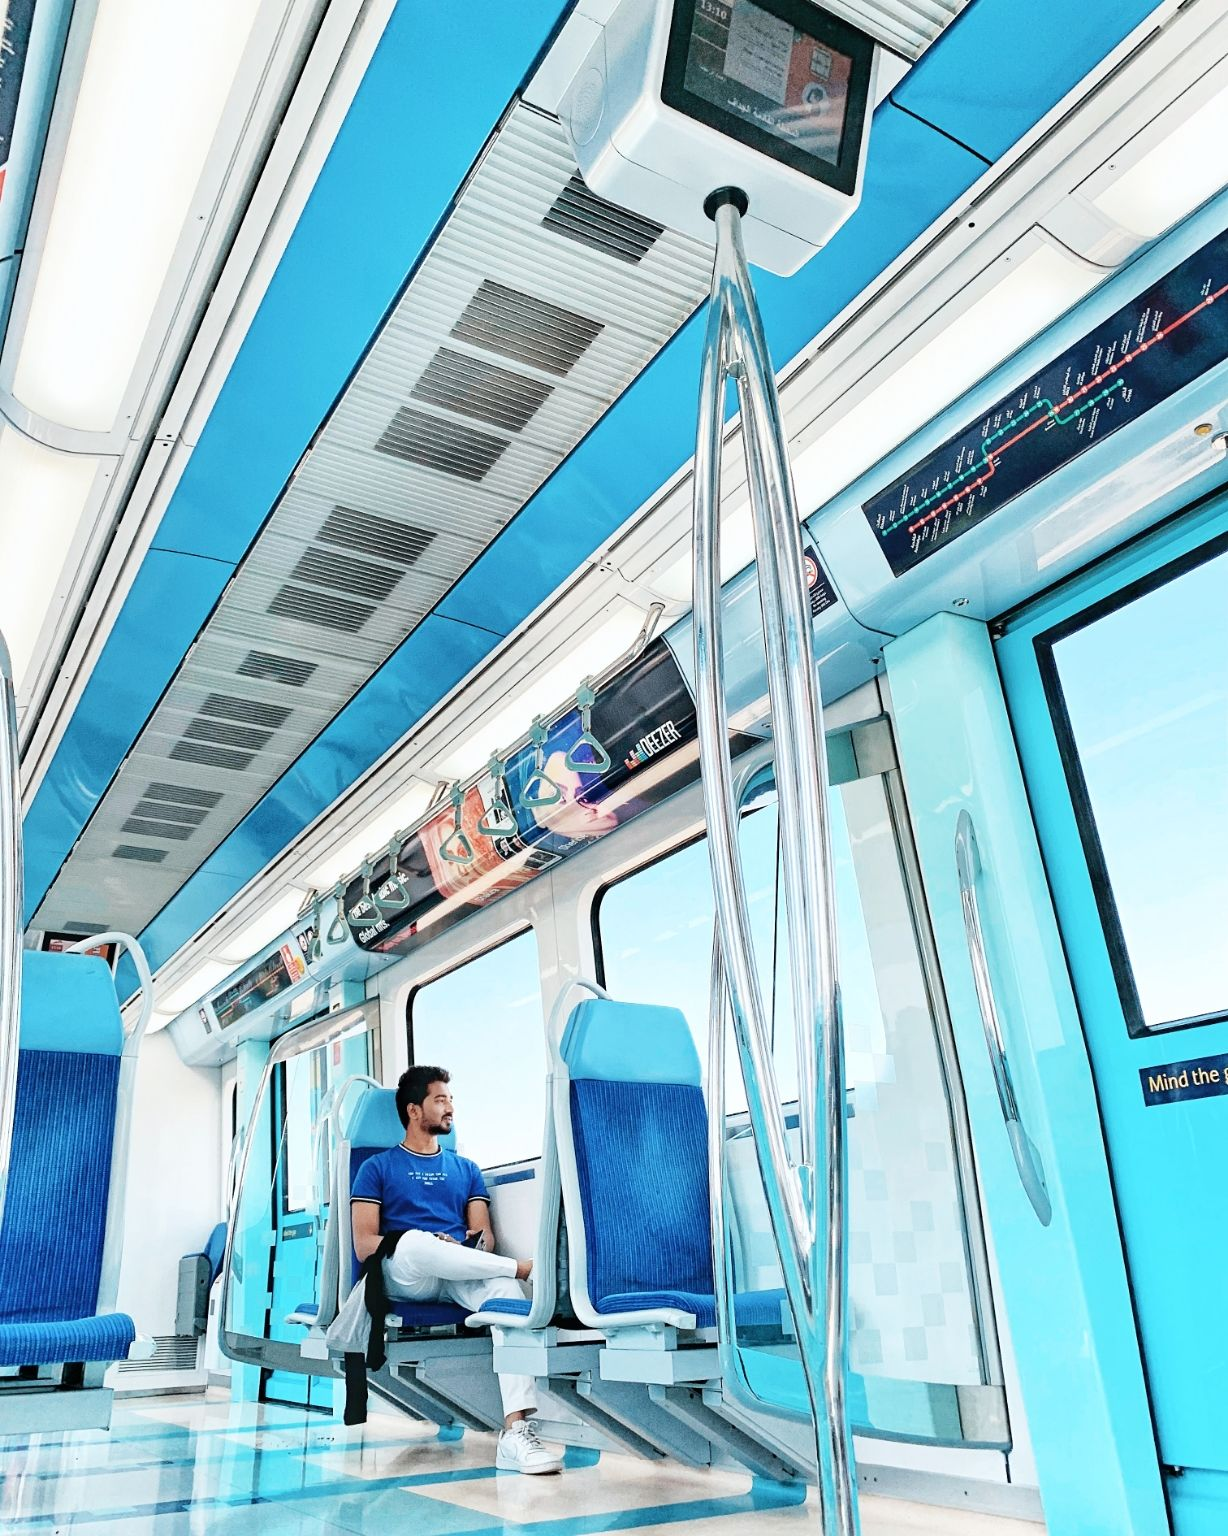 Photo of Creek Metro Station - Dubai - United Arab Emirates By Vishal Jadav